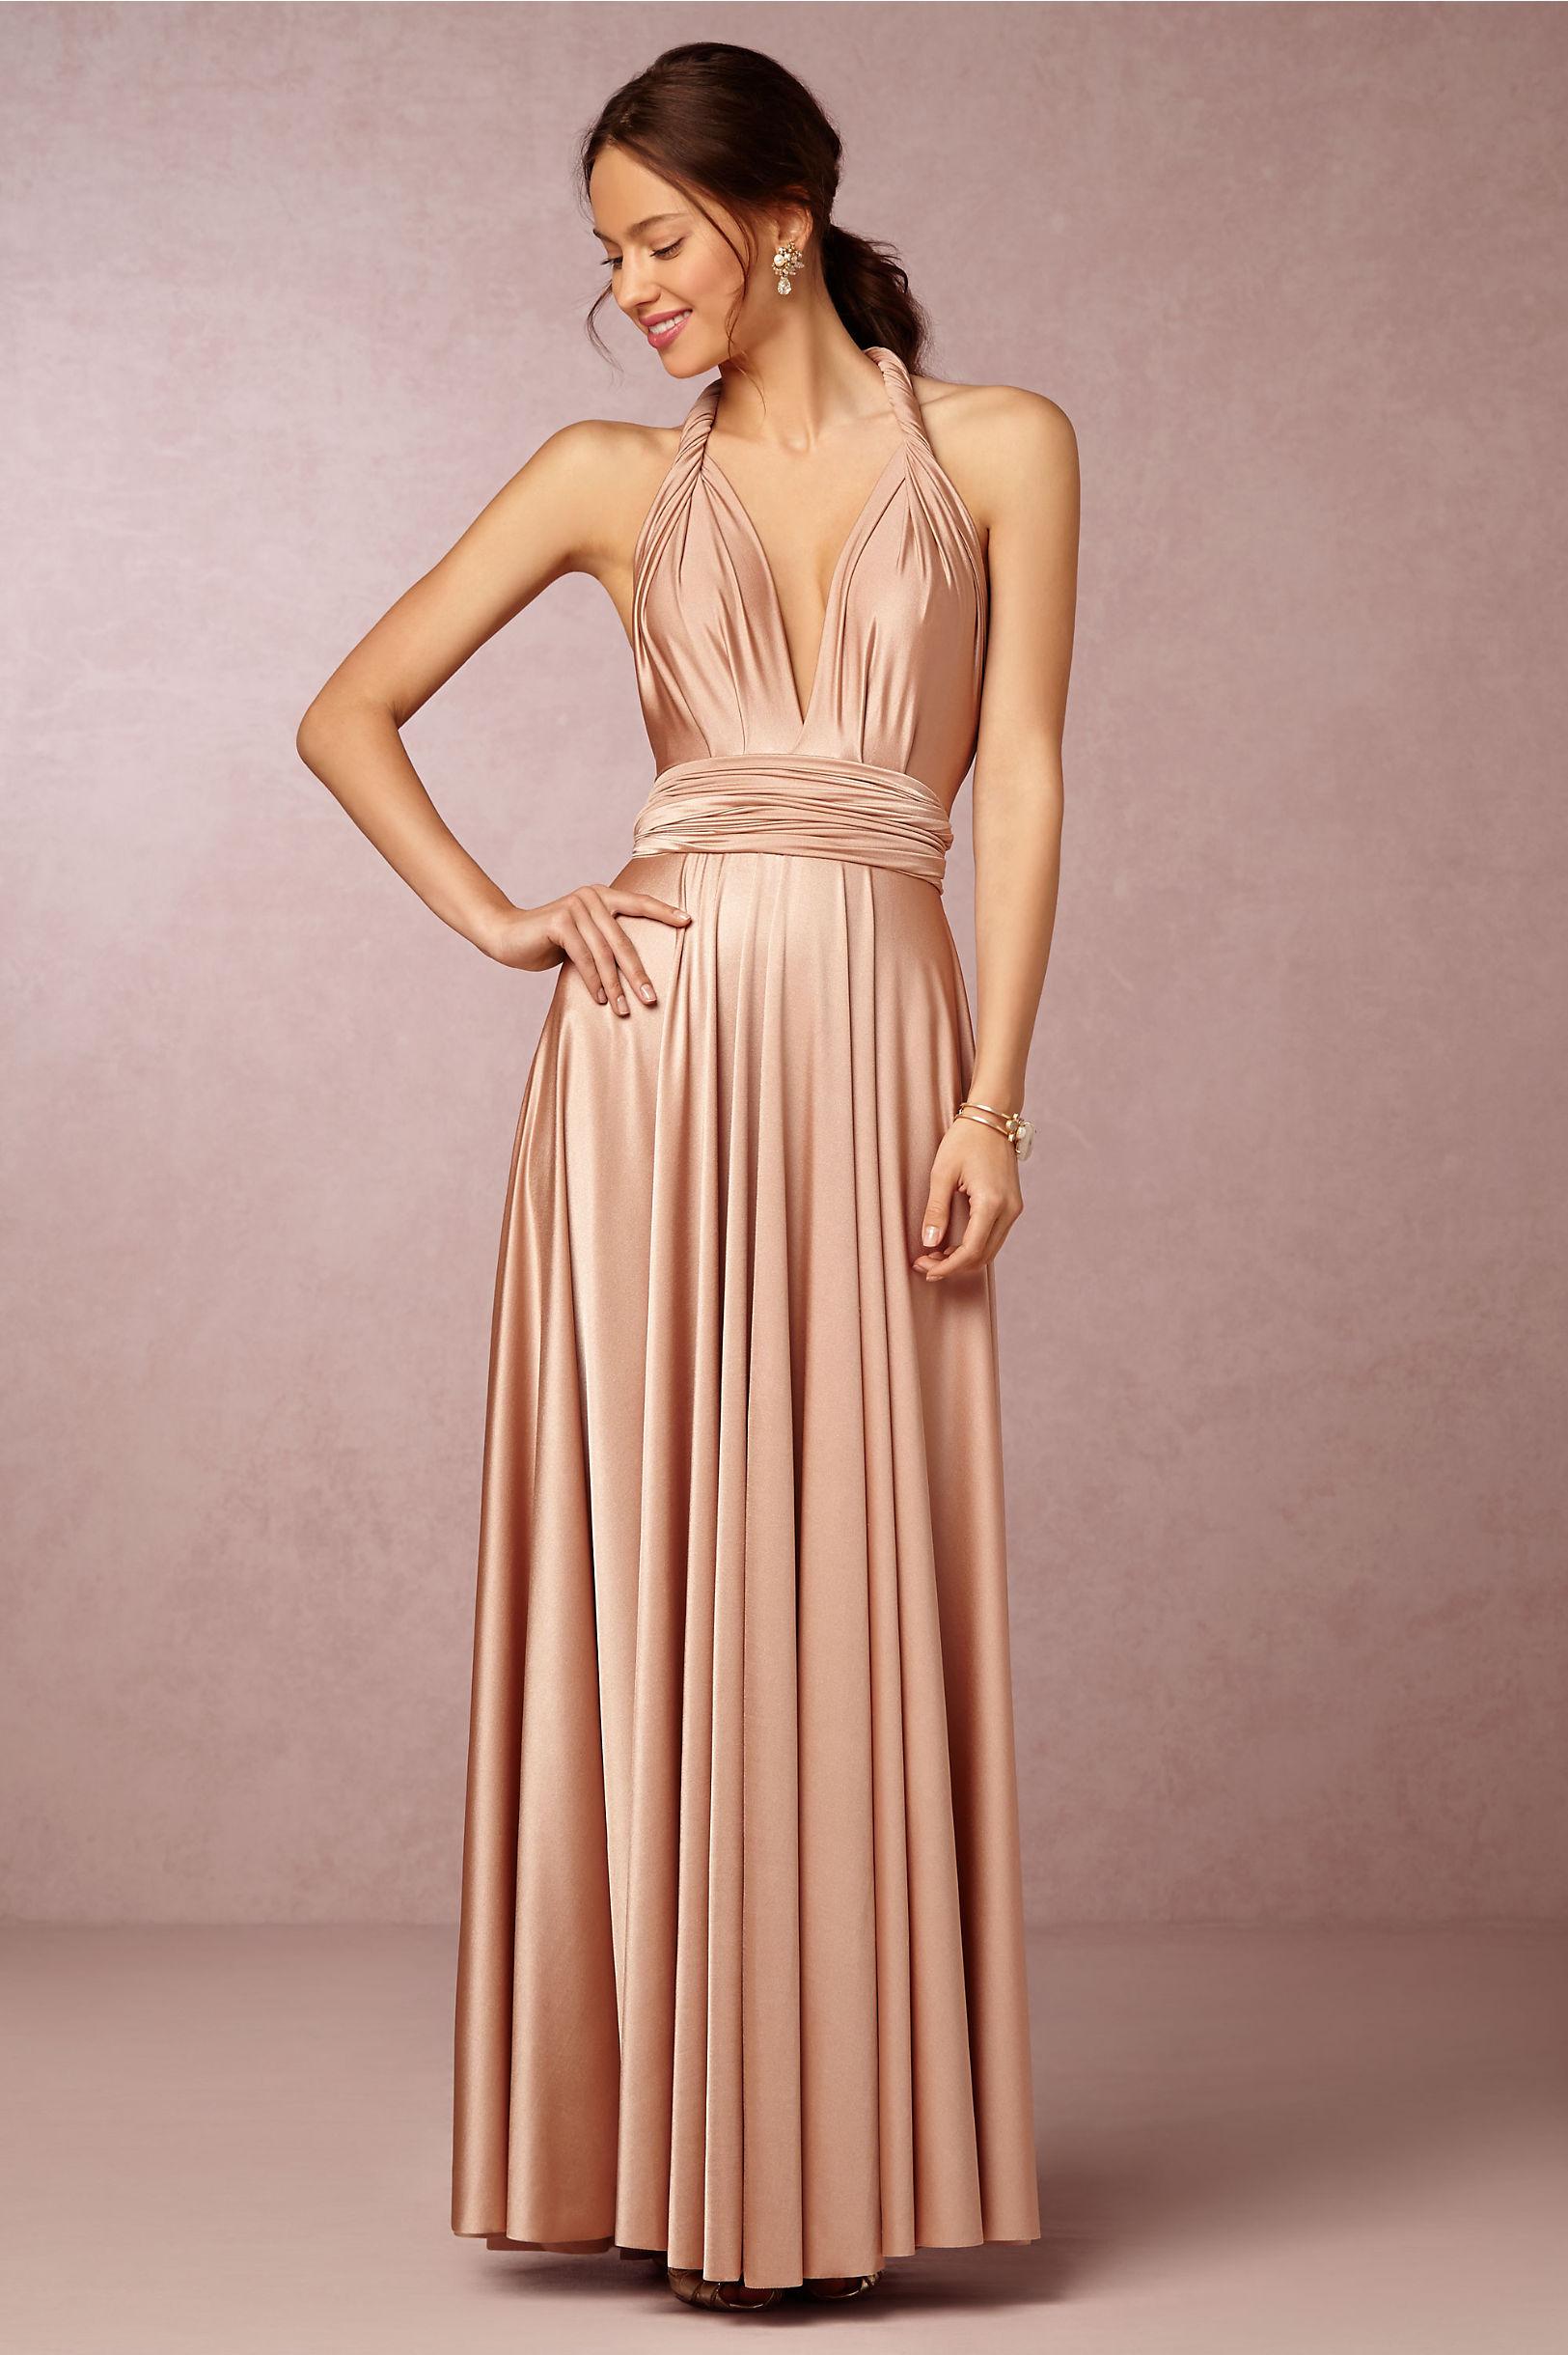 aec7d6872a9 Satin Bridesmaid Dresses Long - Data Dynamic AG